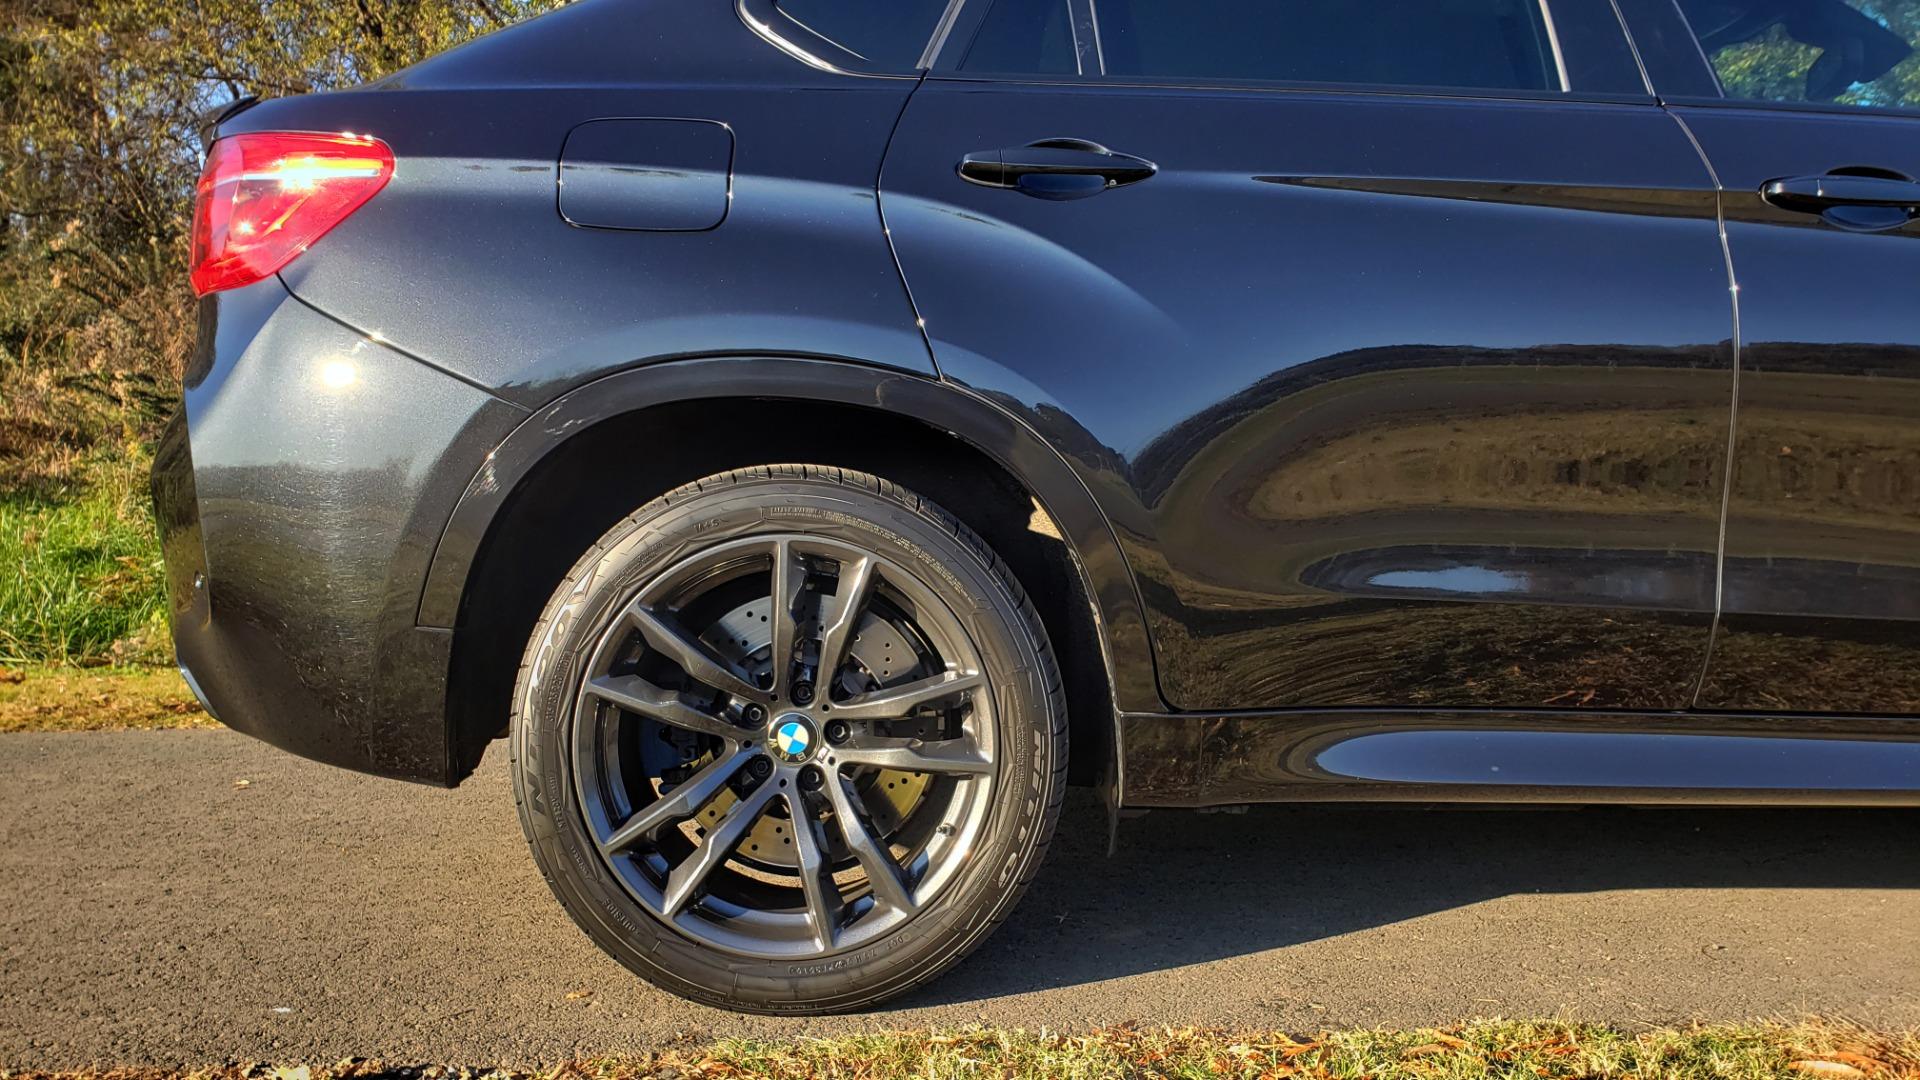 Used 2016 BMW X6 M EXEC PKG / DRVR ASST / NAV / SUNROOF / BLIND SPOT / REARVIEW for sale Sold at Formula Imports in Charlotte NC 28227 89